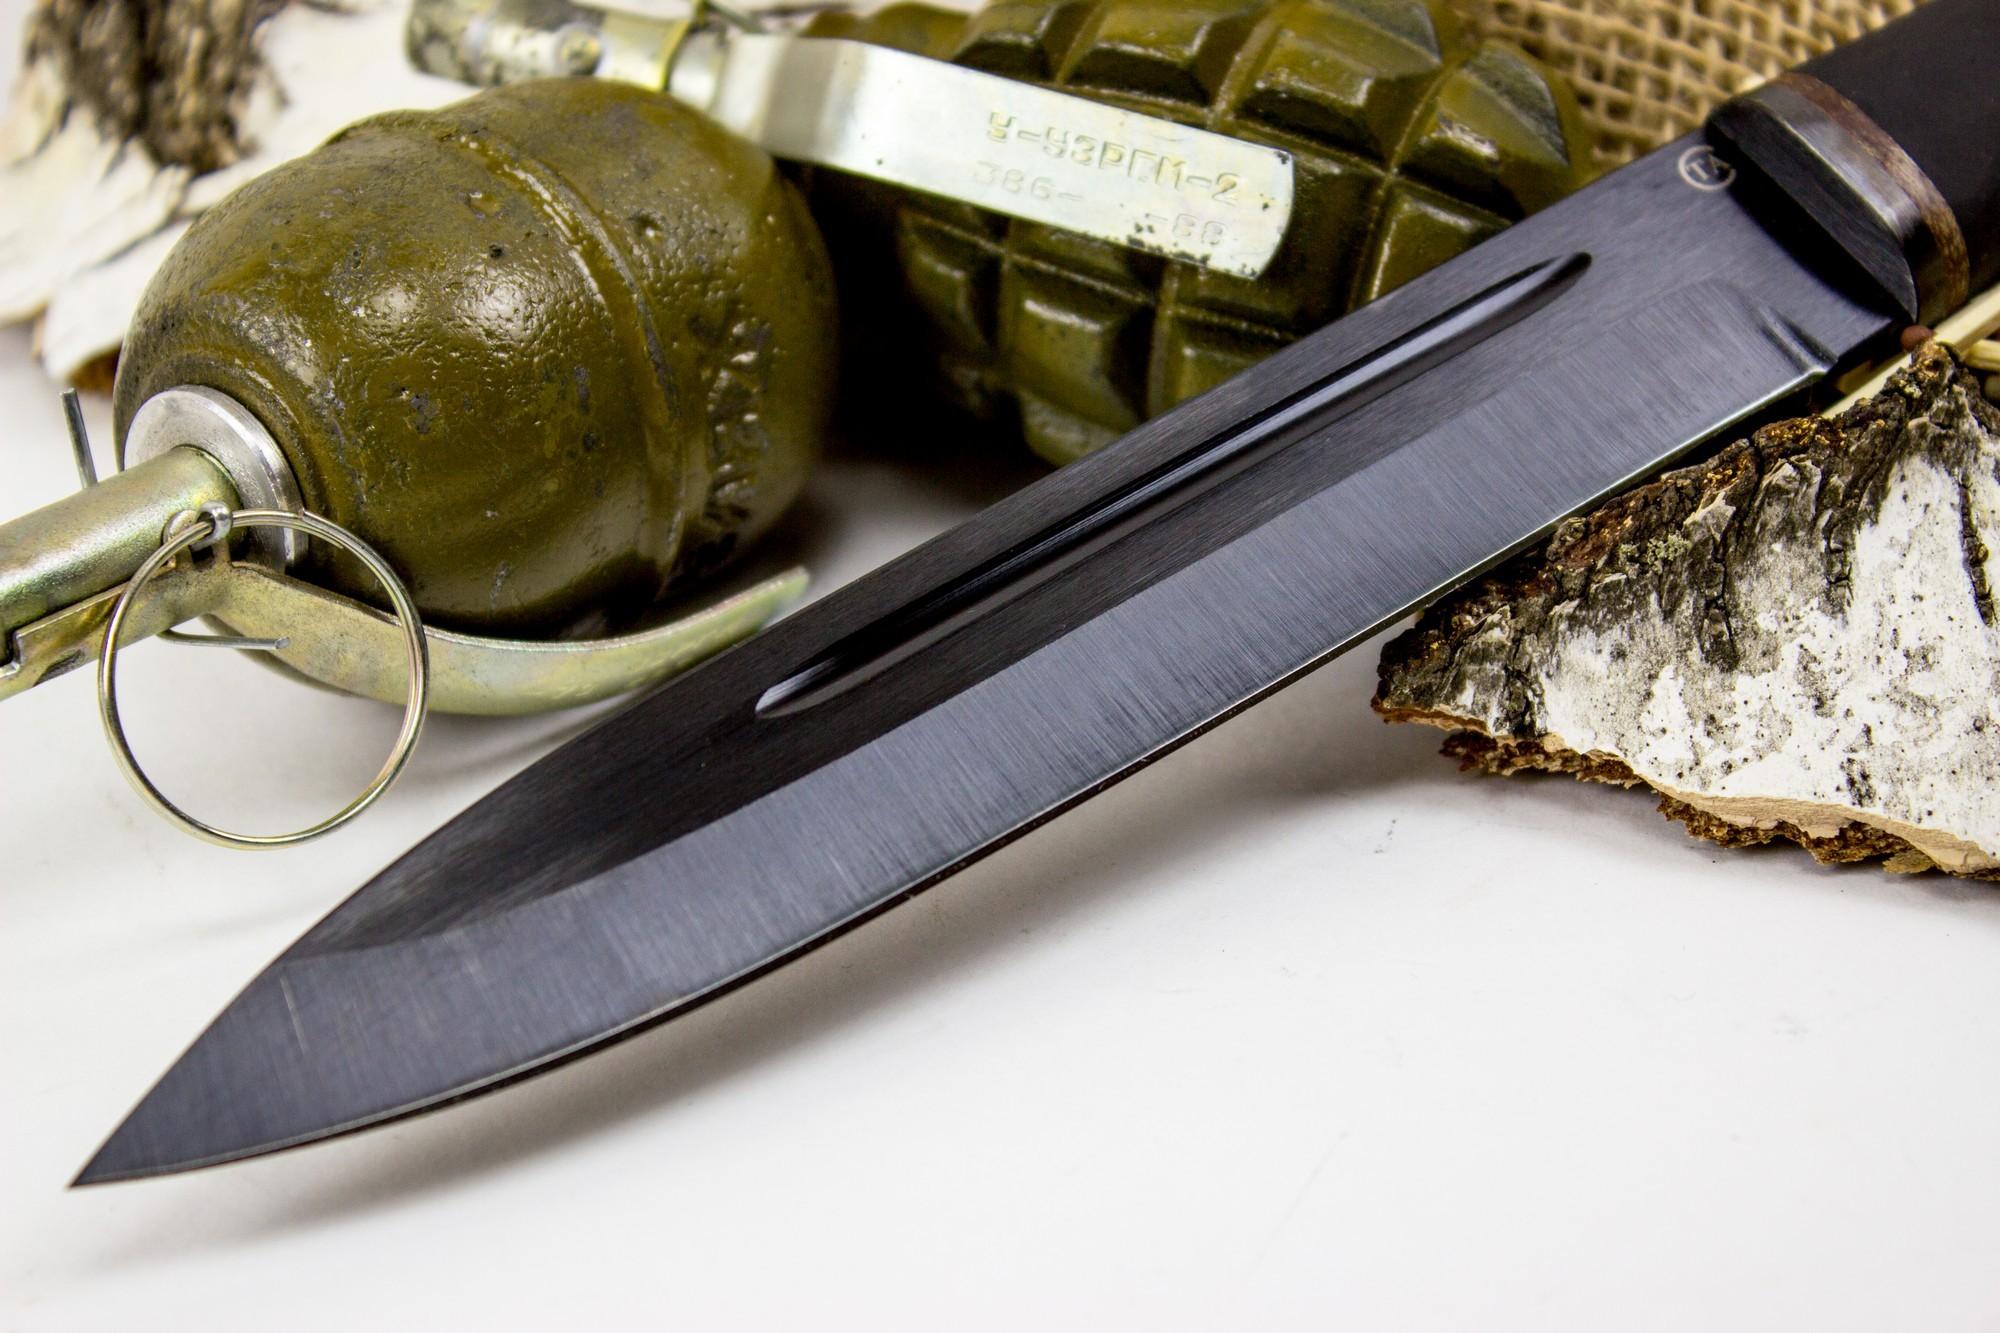 Фото 7 - Нож Горец-2, сталь 65Г, резина от Титов и Солдатова